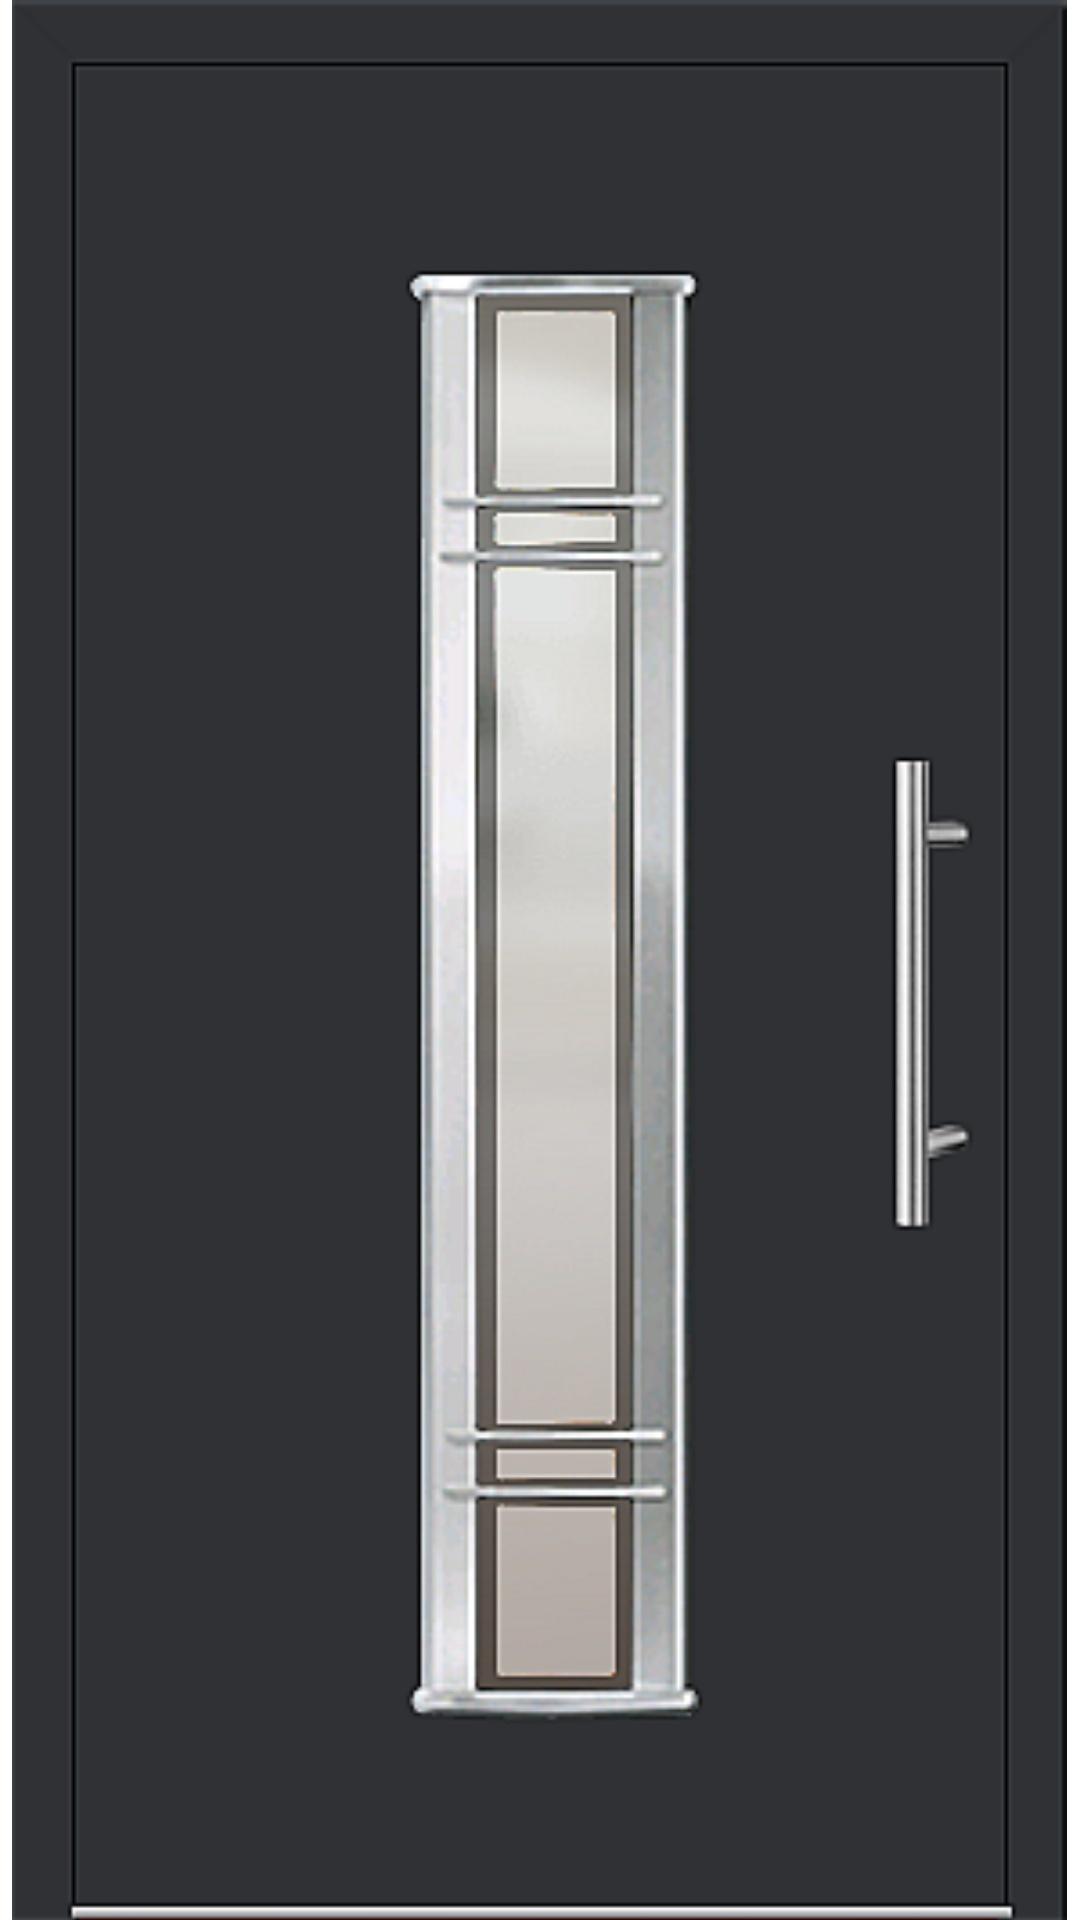 Aluminium Haustür Modell 6962-79 schwarz